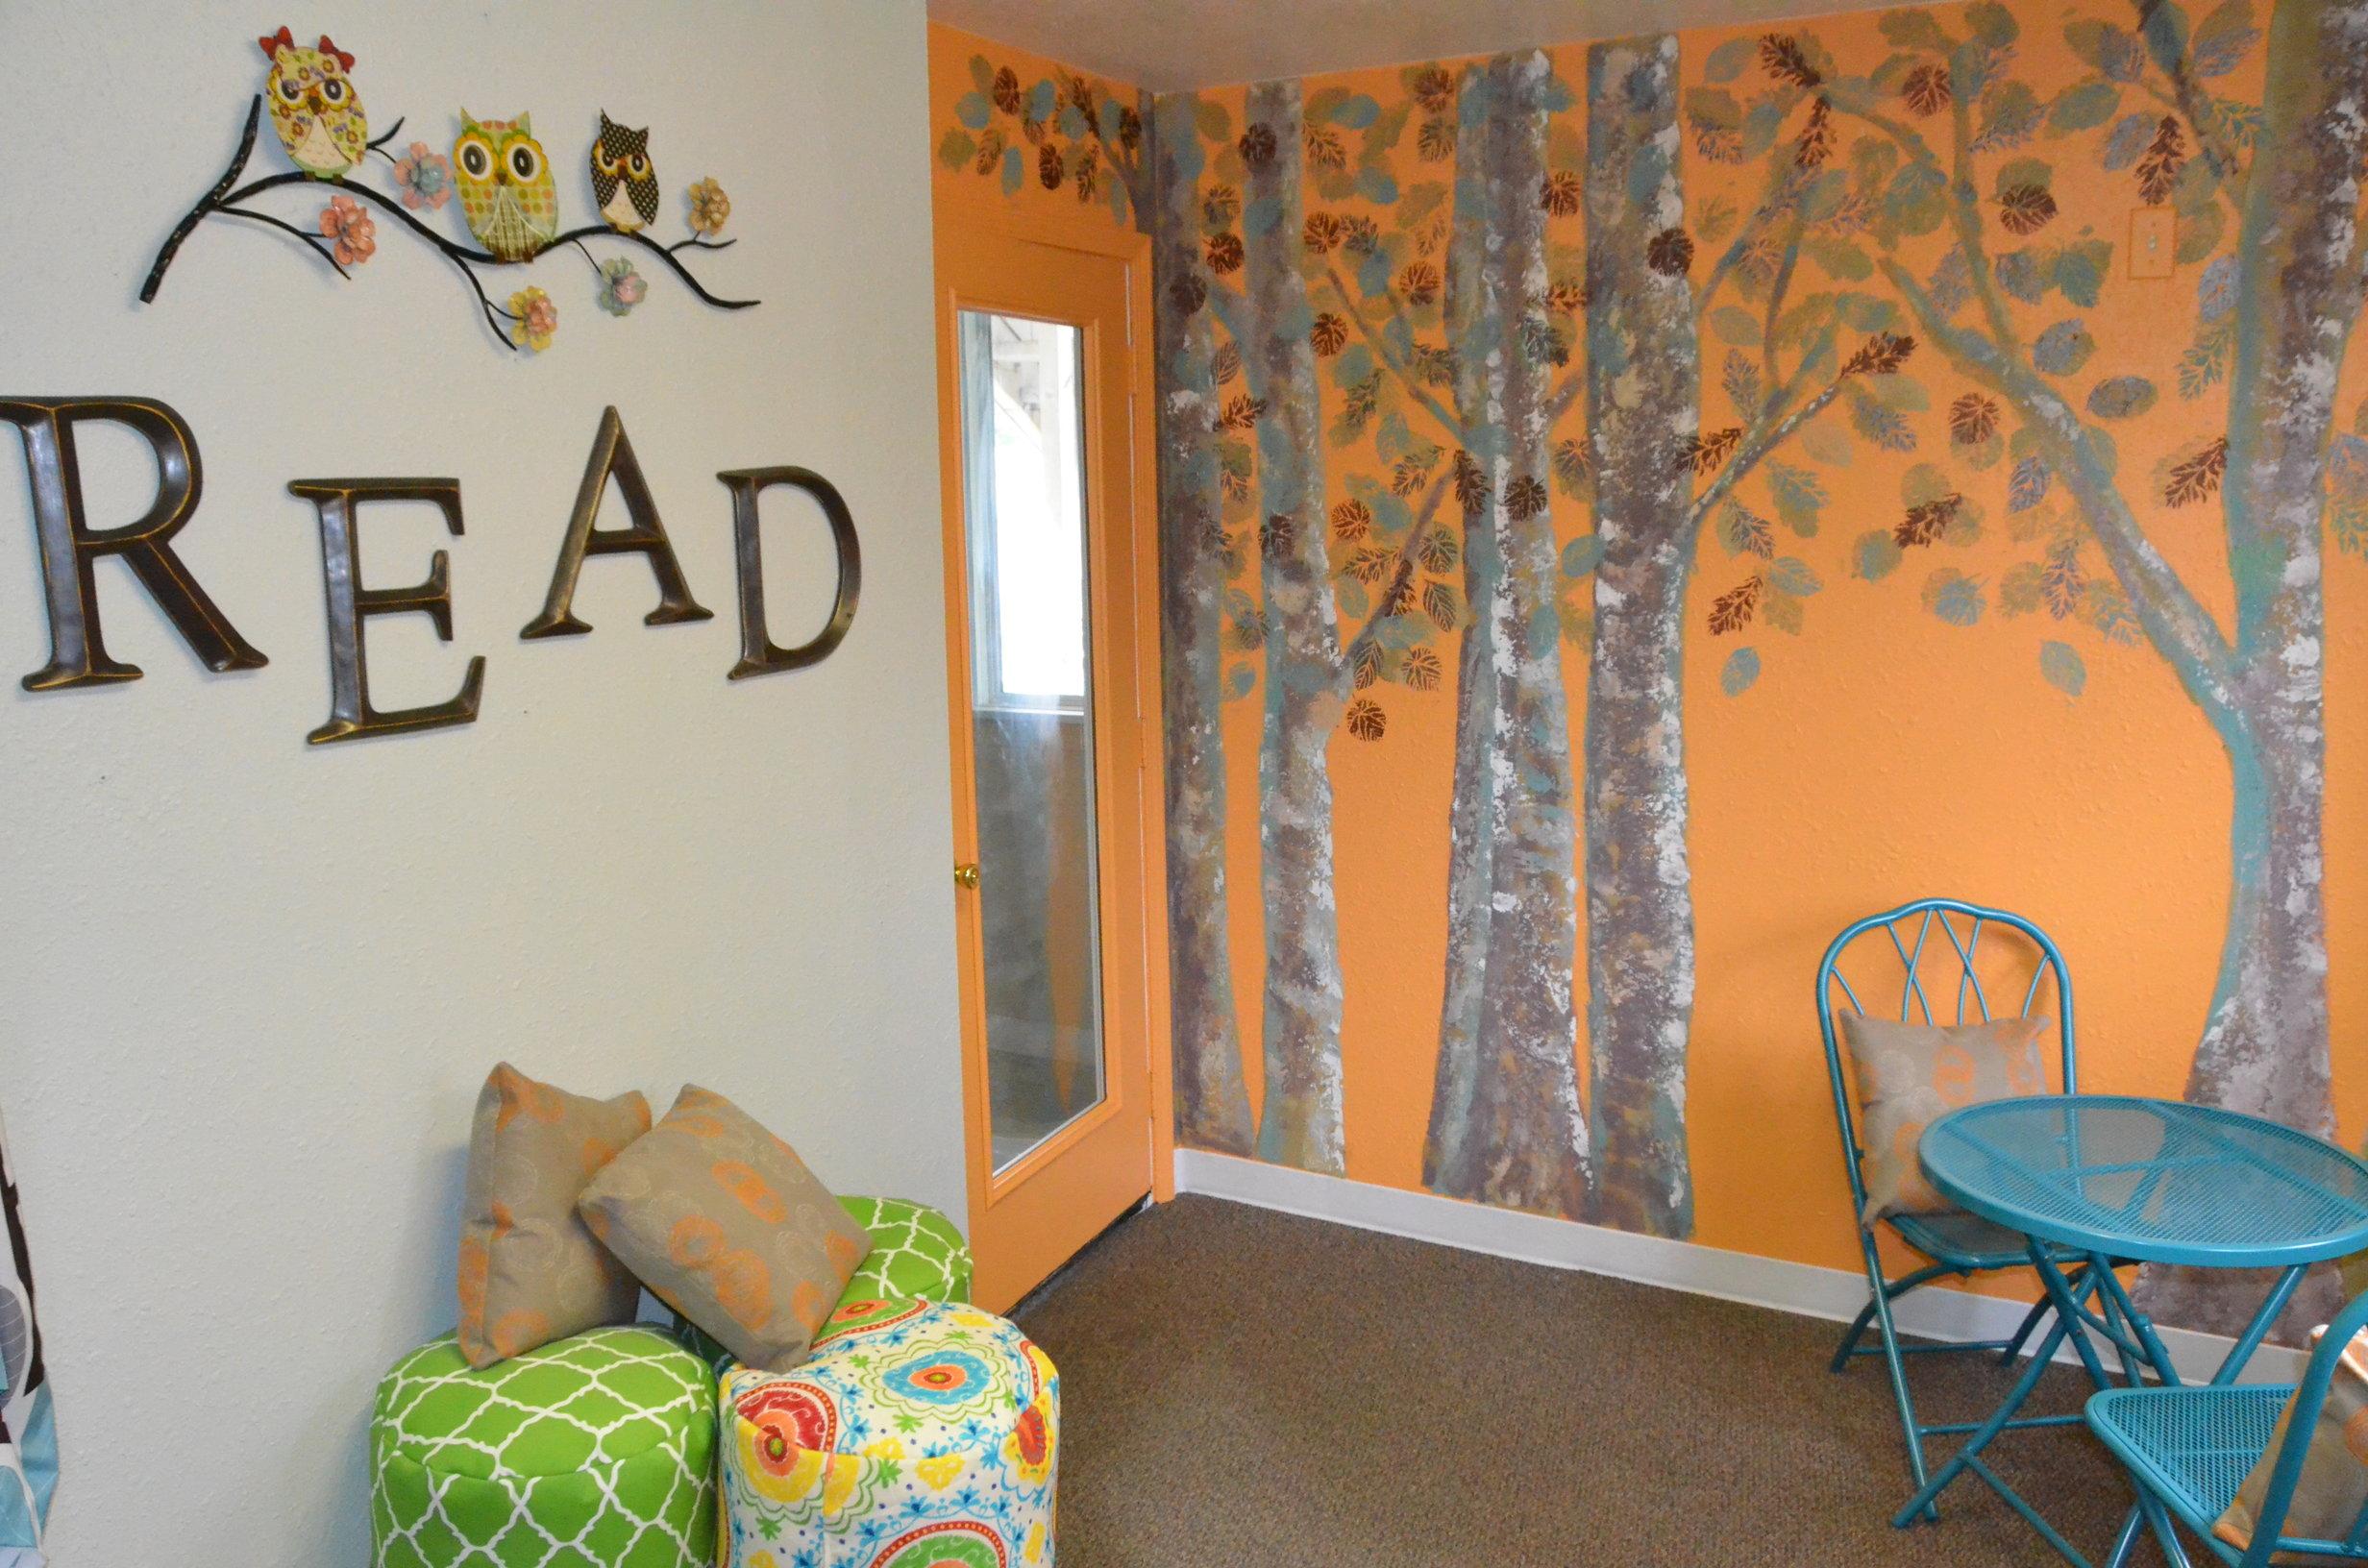 Shelter for Domestic Violence Survivors – YWCA Spokane